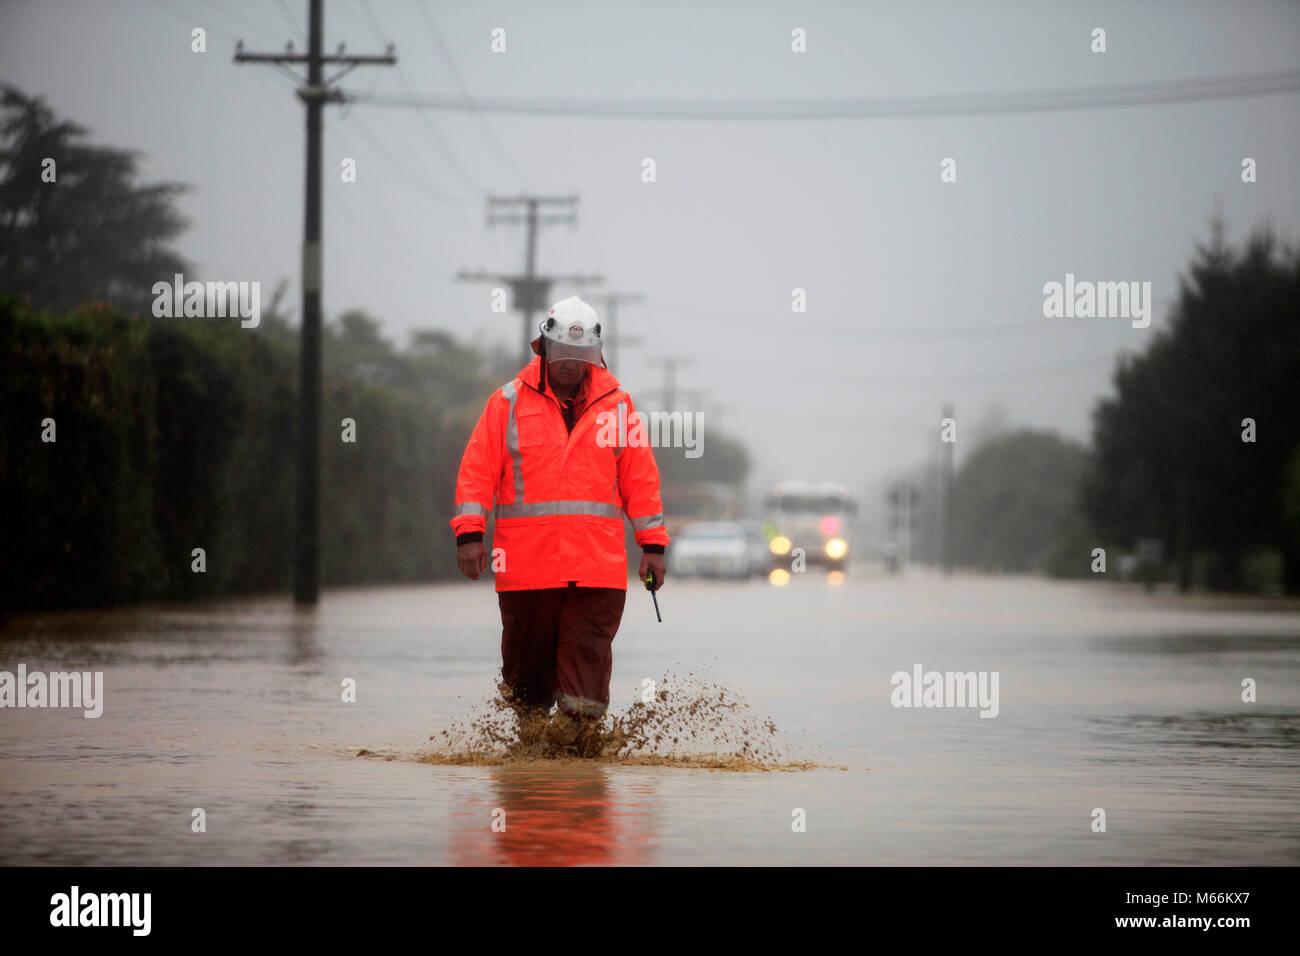 Picture by Tim Cuff 20 February 2018 - Cyclone Gita hits Riwaka hard, Nelson Tasman district, New Zealand - Stock Image